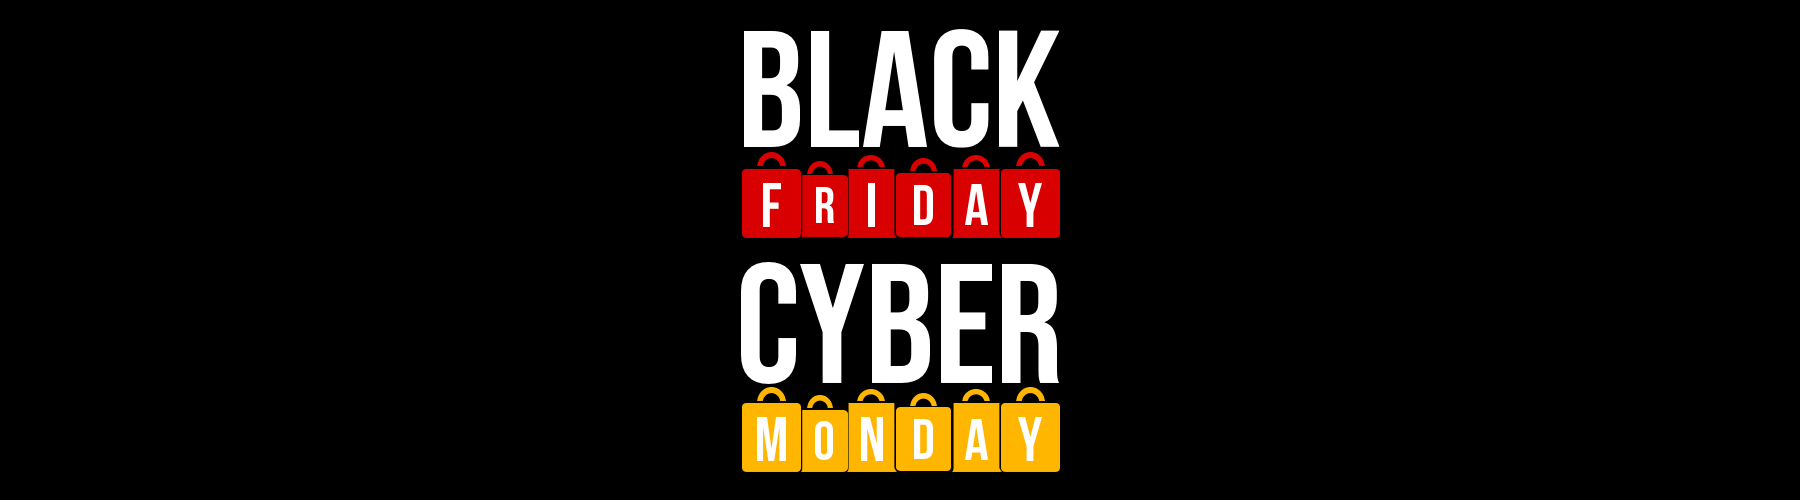 Black Friday vs Cyber Monday – ¿Cuál da mejores resultados?